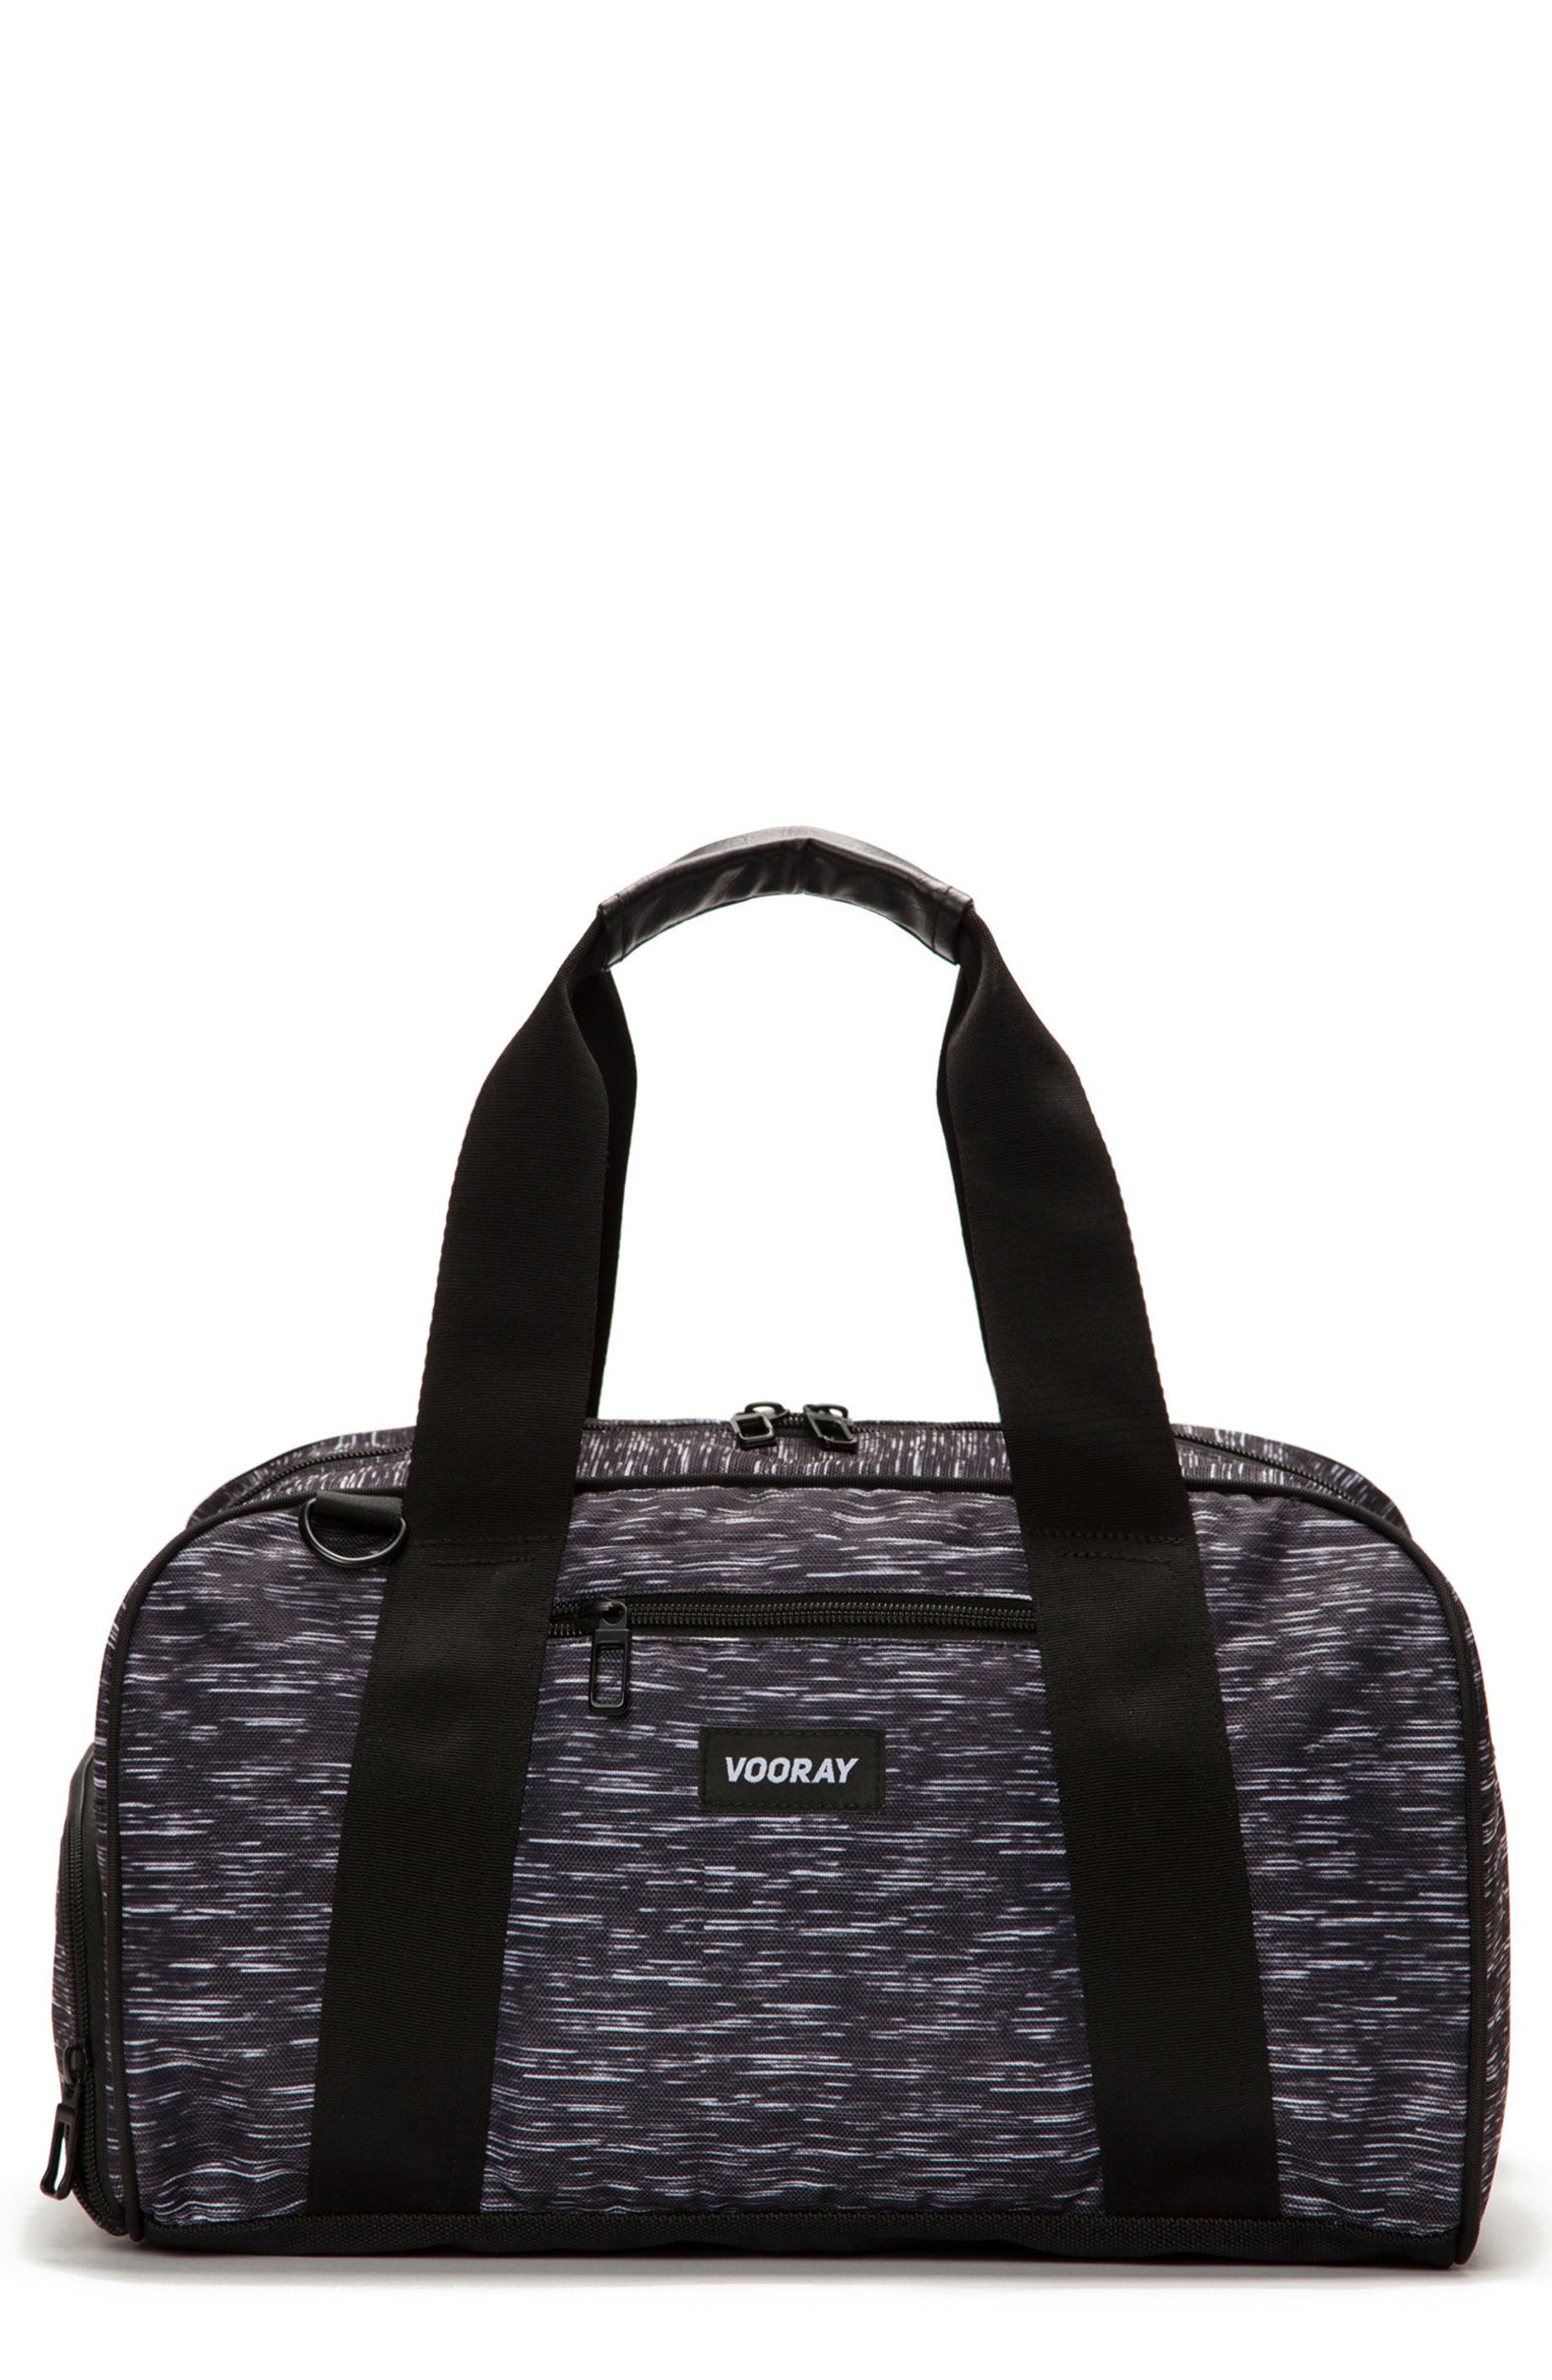 Burner Gym Bag,                             Main thumbnail 1, color,                             ATHLETIC BLACK